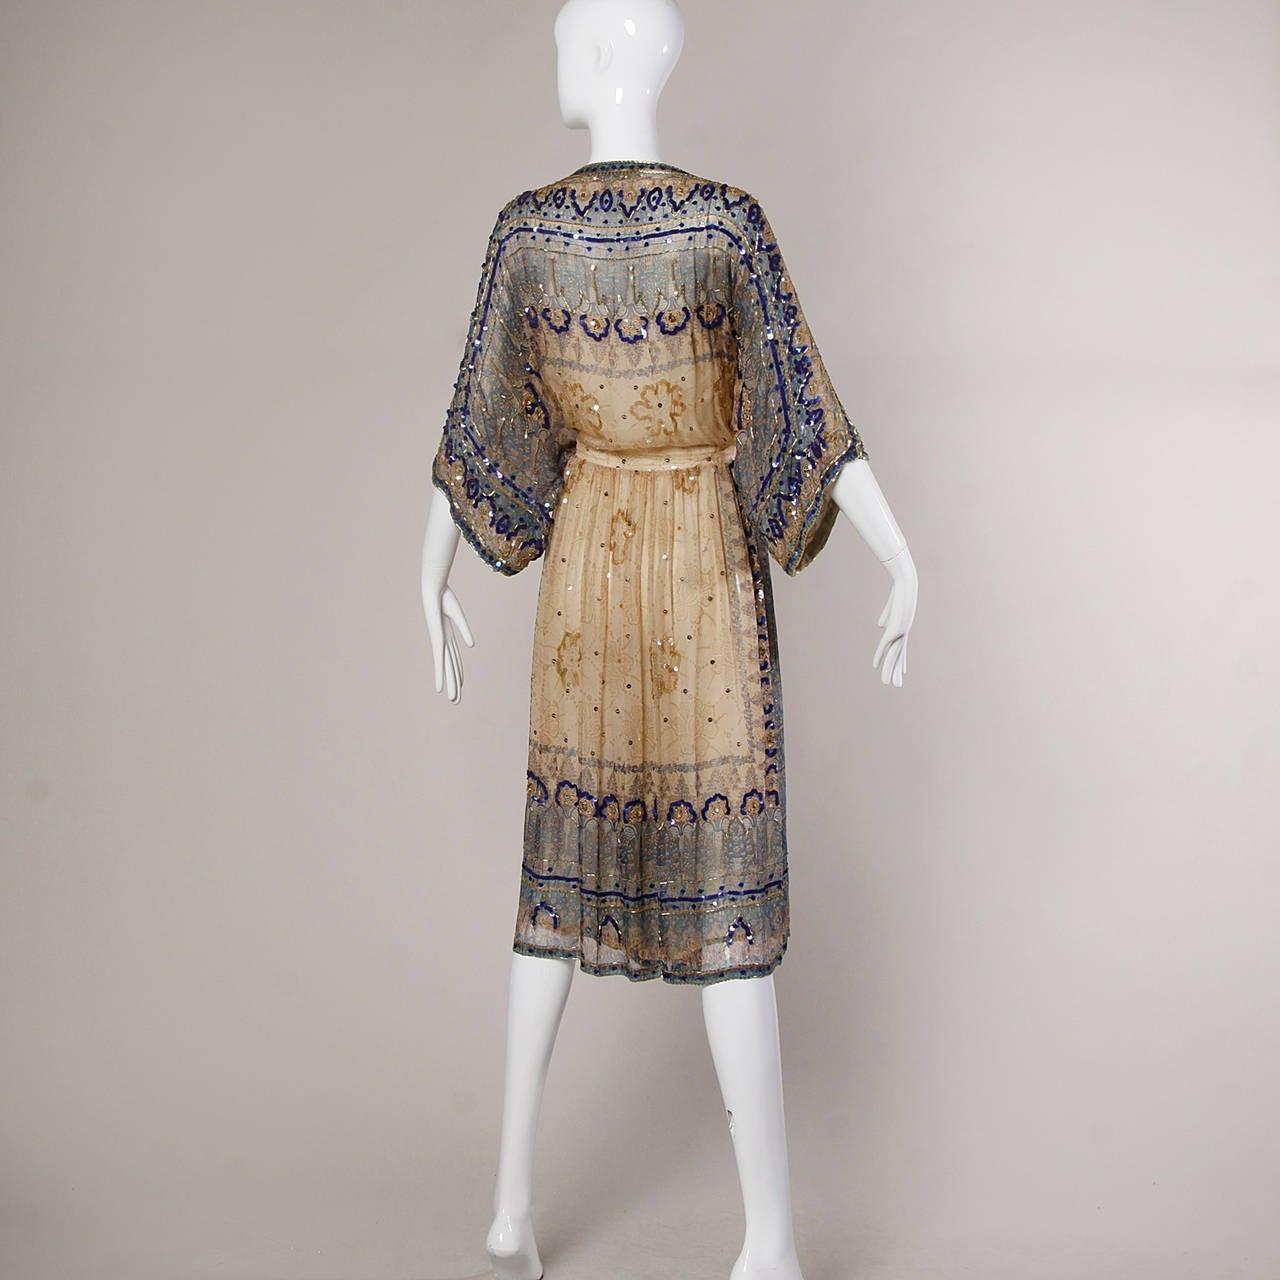 Judith Ann for Bullock's Wilshire Vintage 1970s Silk India Print Dress 8